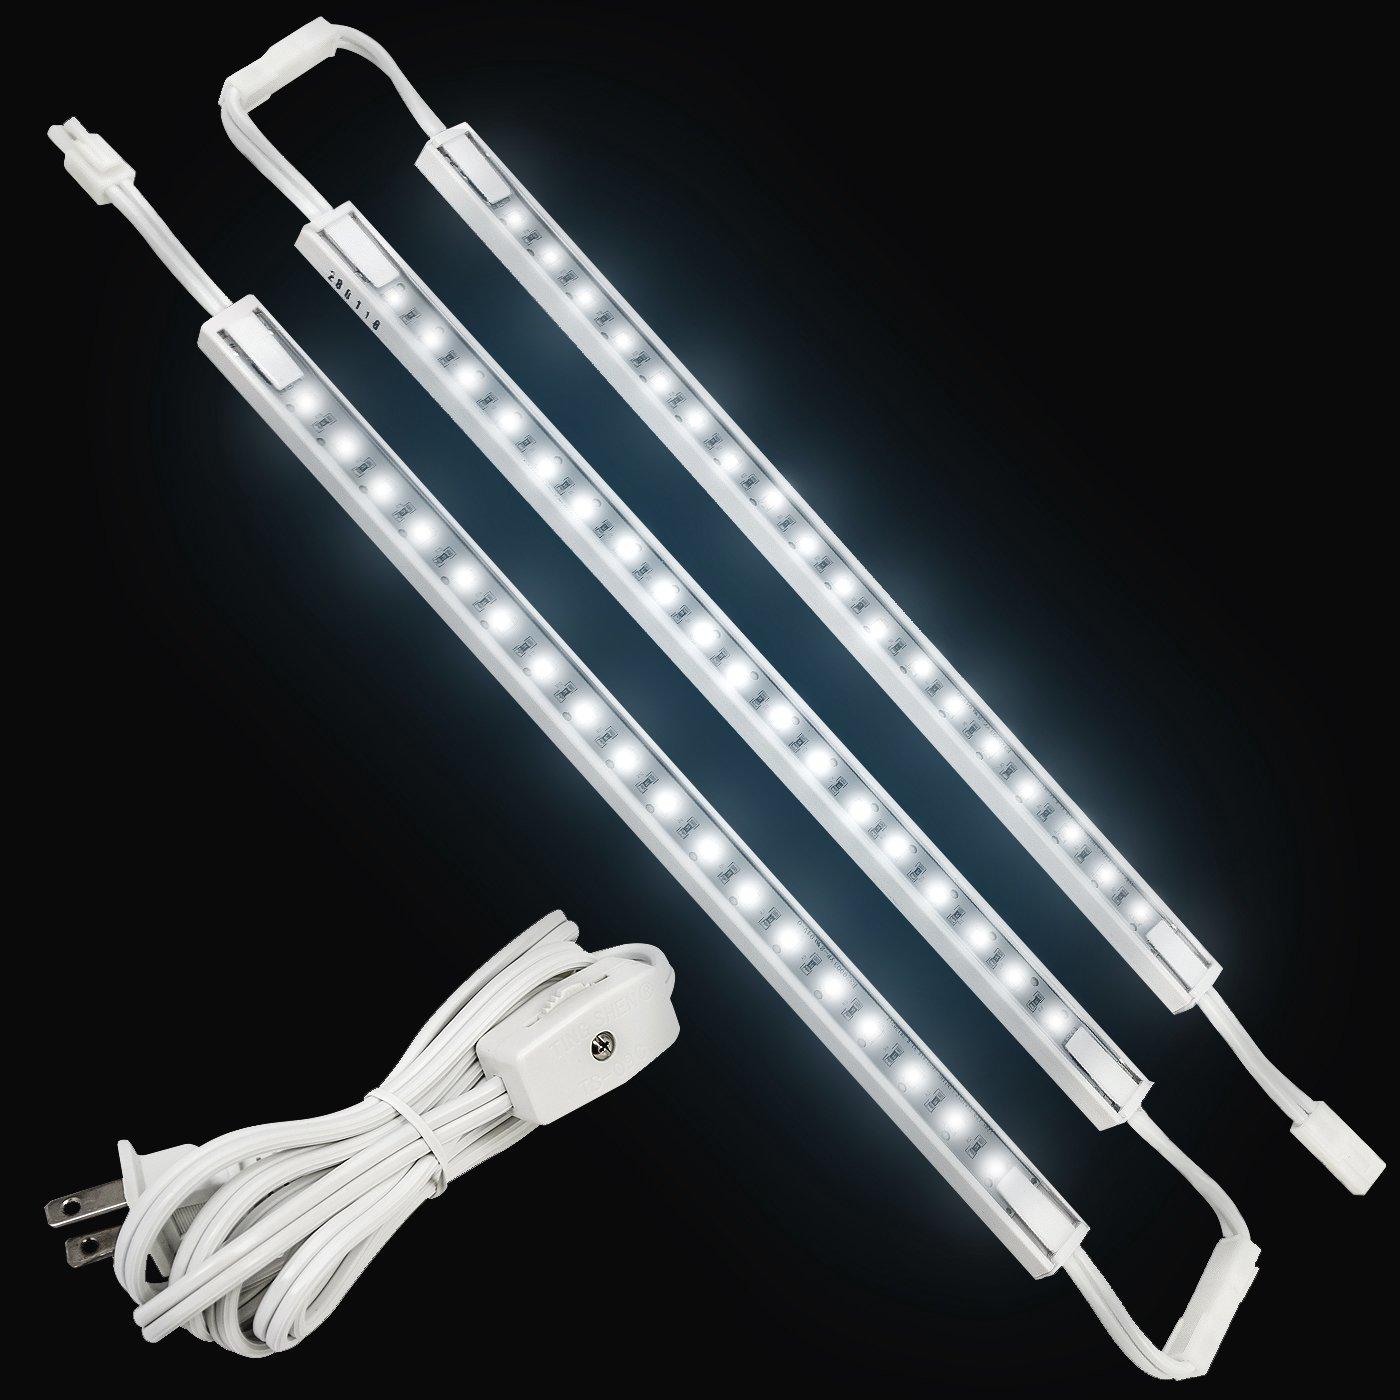 LED Concepts Under Cabinet & Closet Linkable LED Light Bars -ETL Listed Power Supply (12'' Inch -3PK, White)